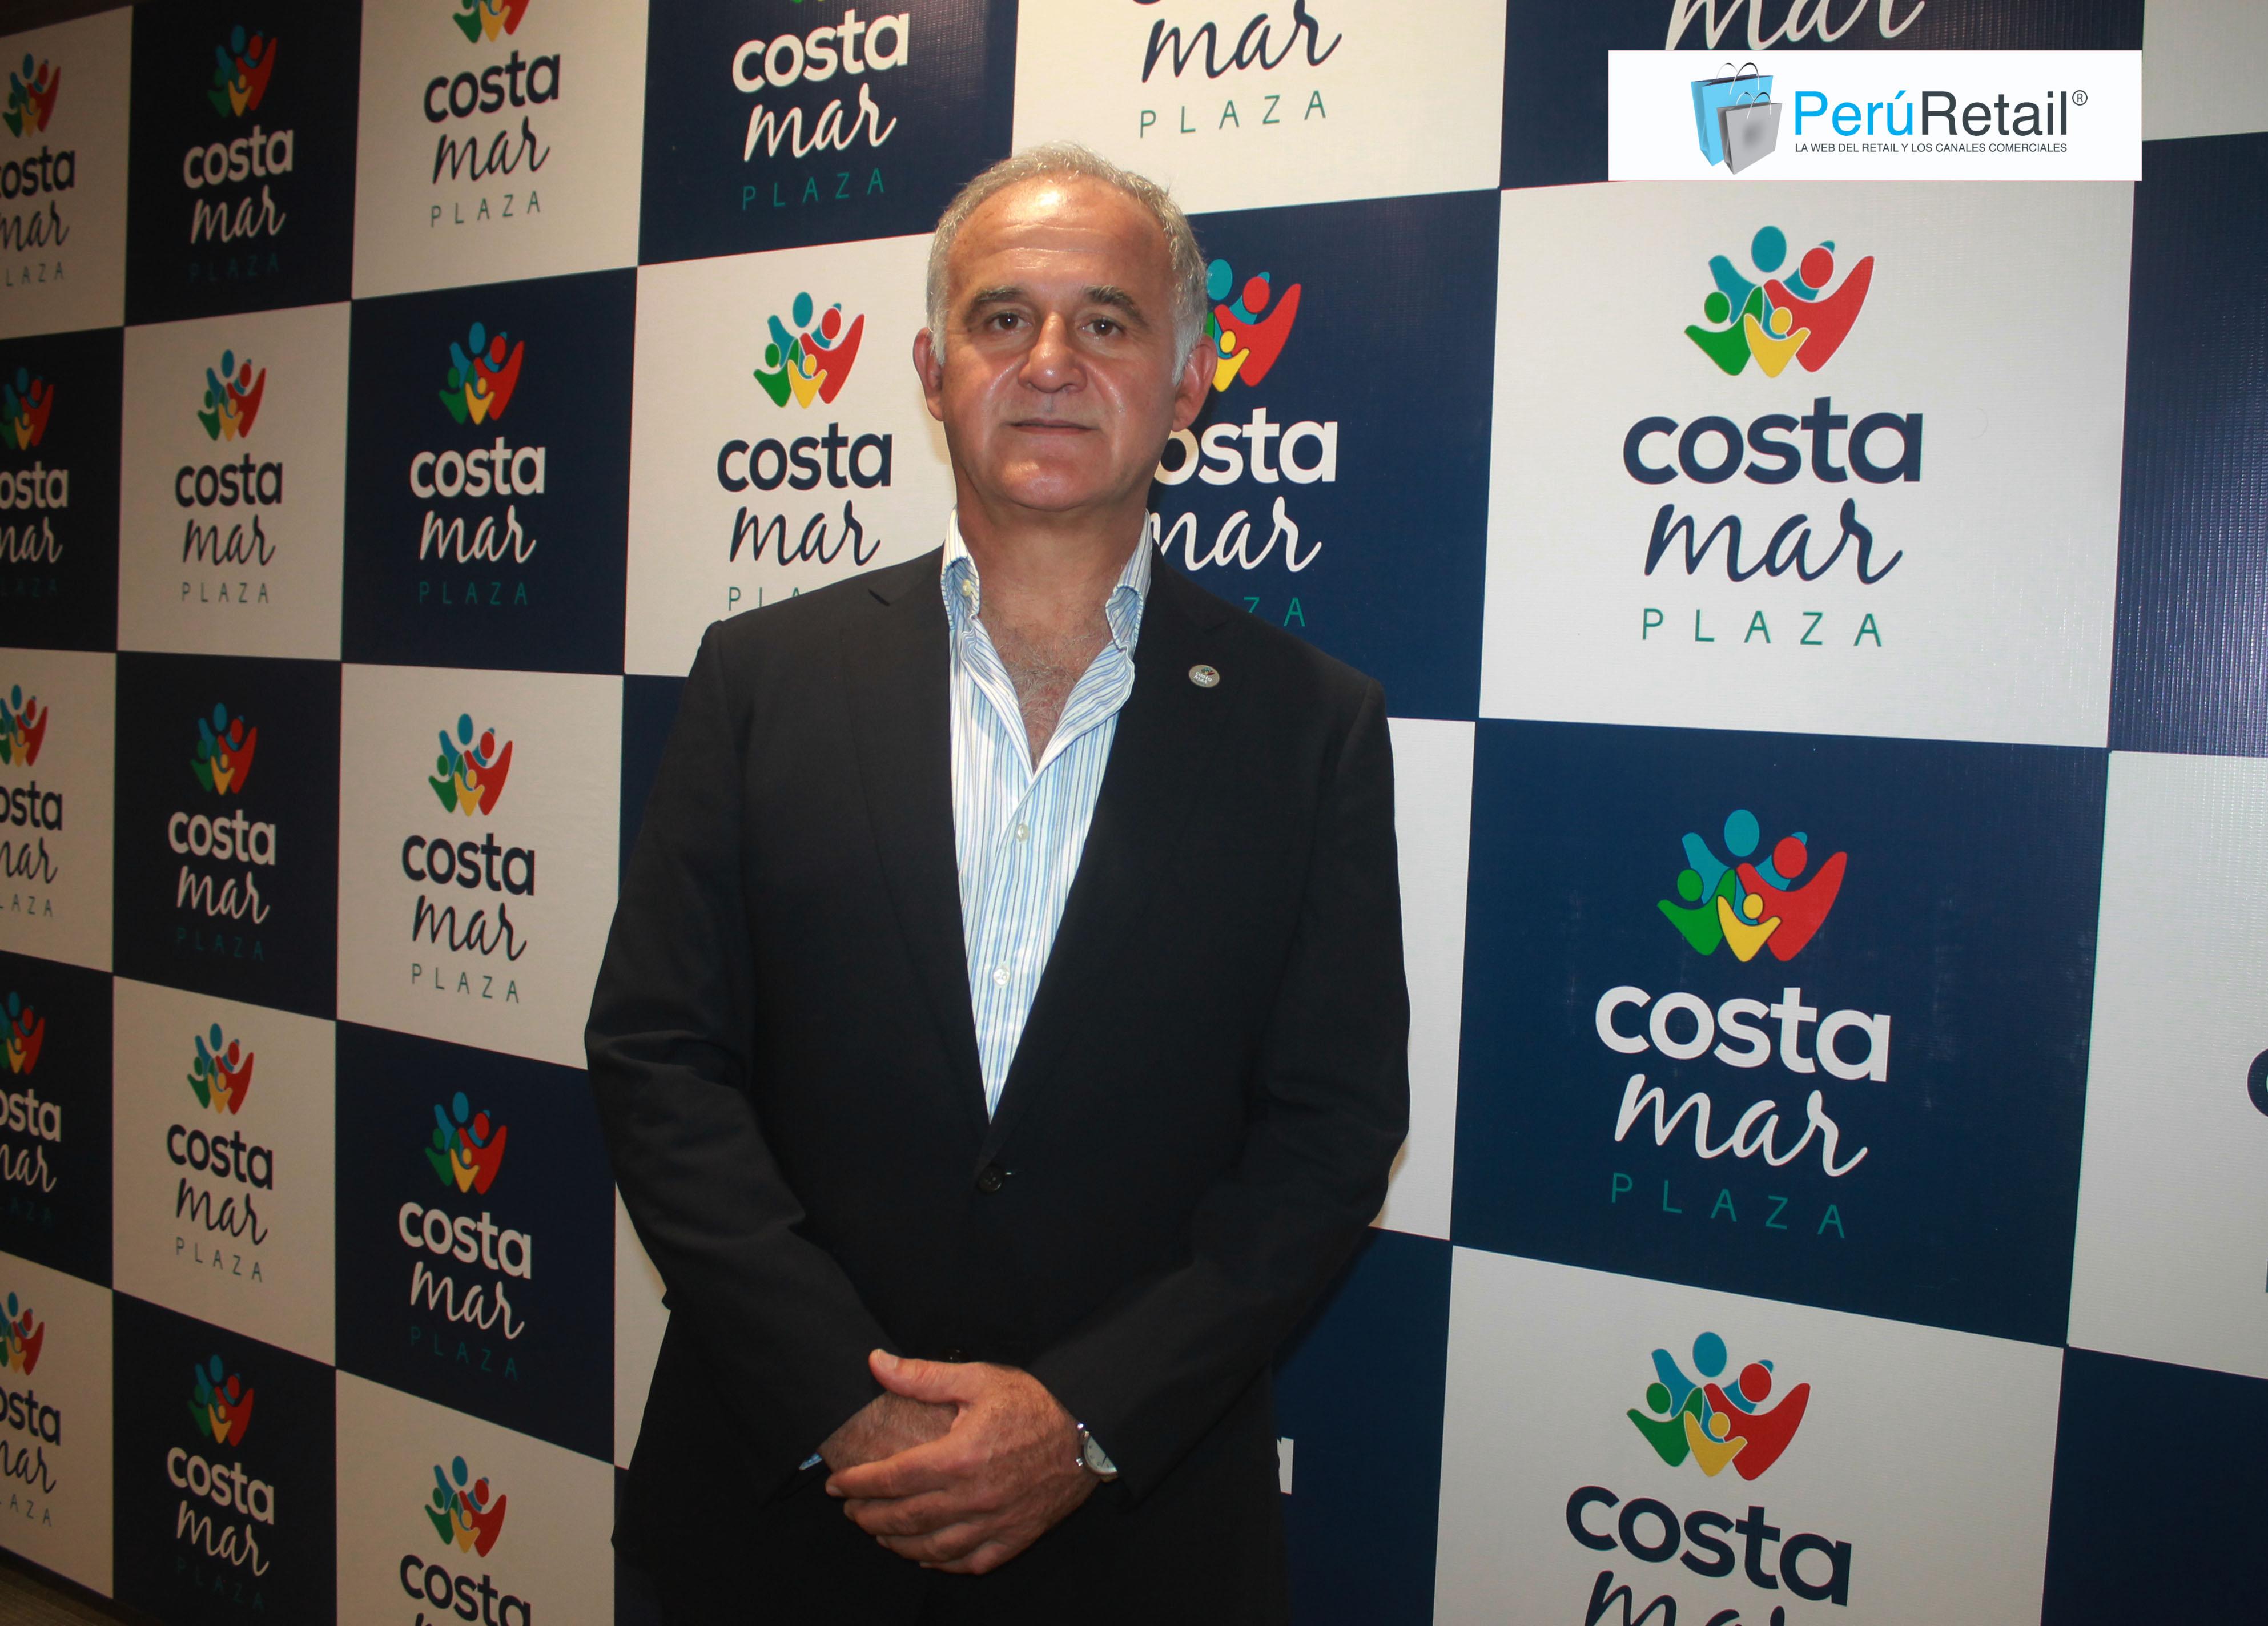 costa mar - Costa Mar Plaza invirtió US$ 33 millones para abrir primer mall en Tumbes